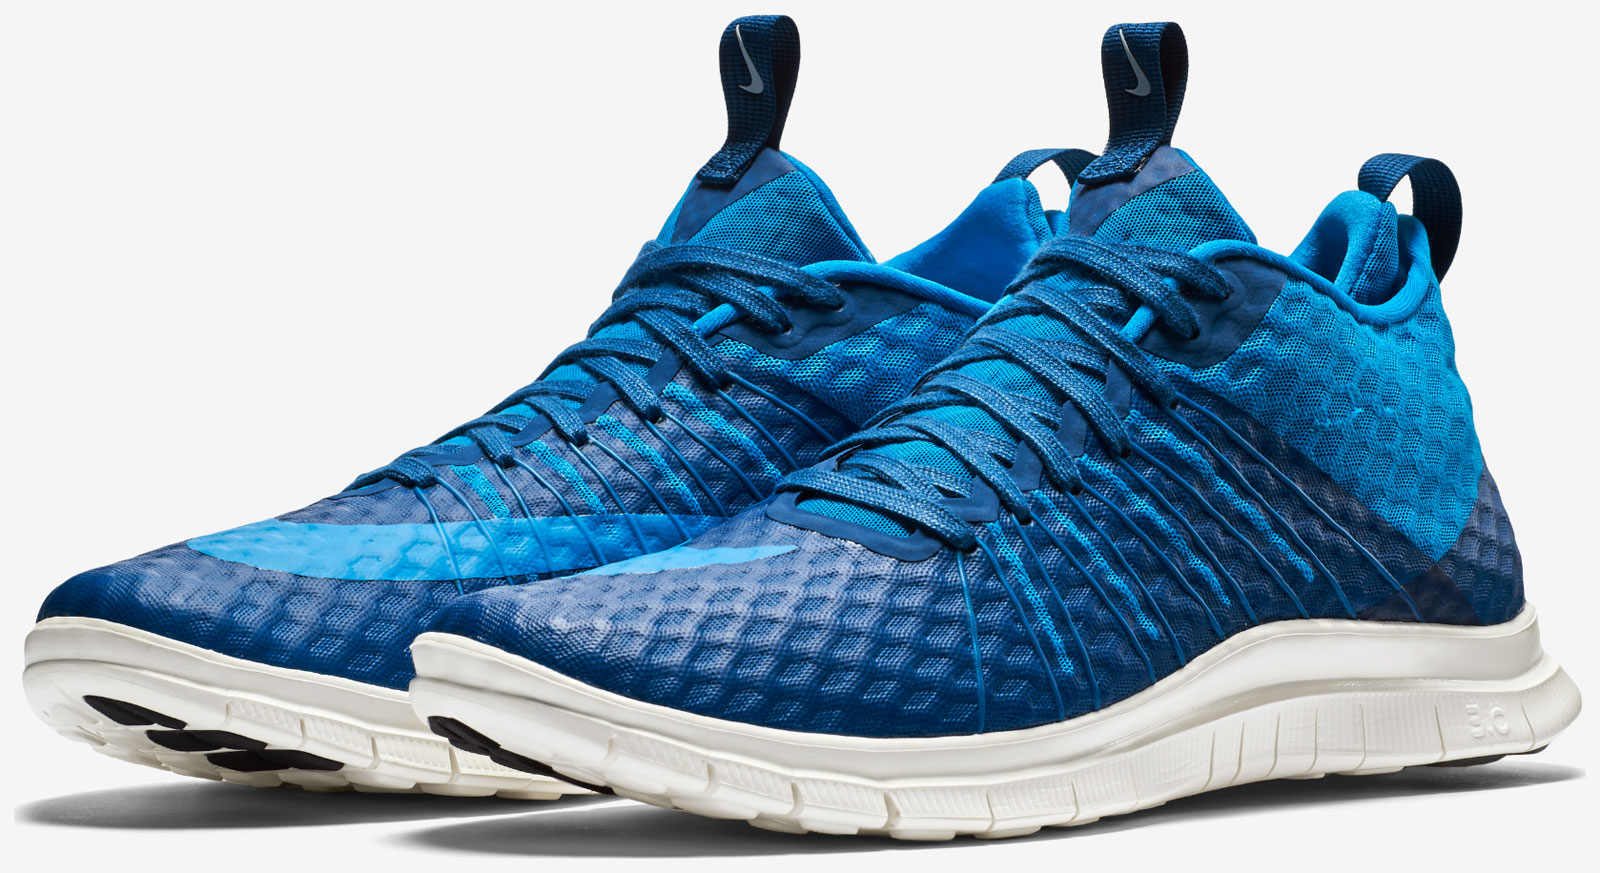 Insignia Blue Nike Free Hypervenom 2 FS Sneakers Revealed